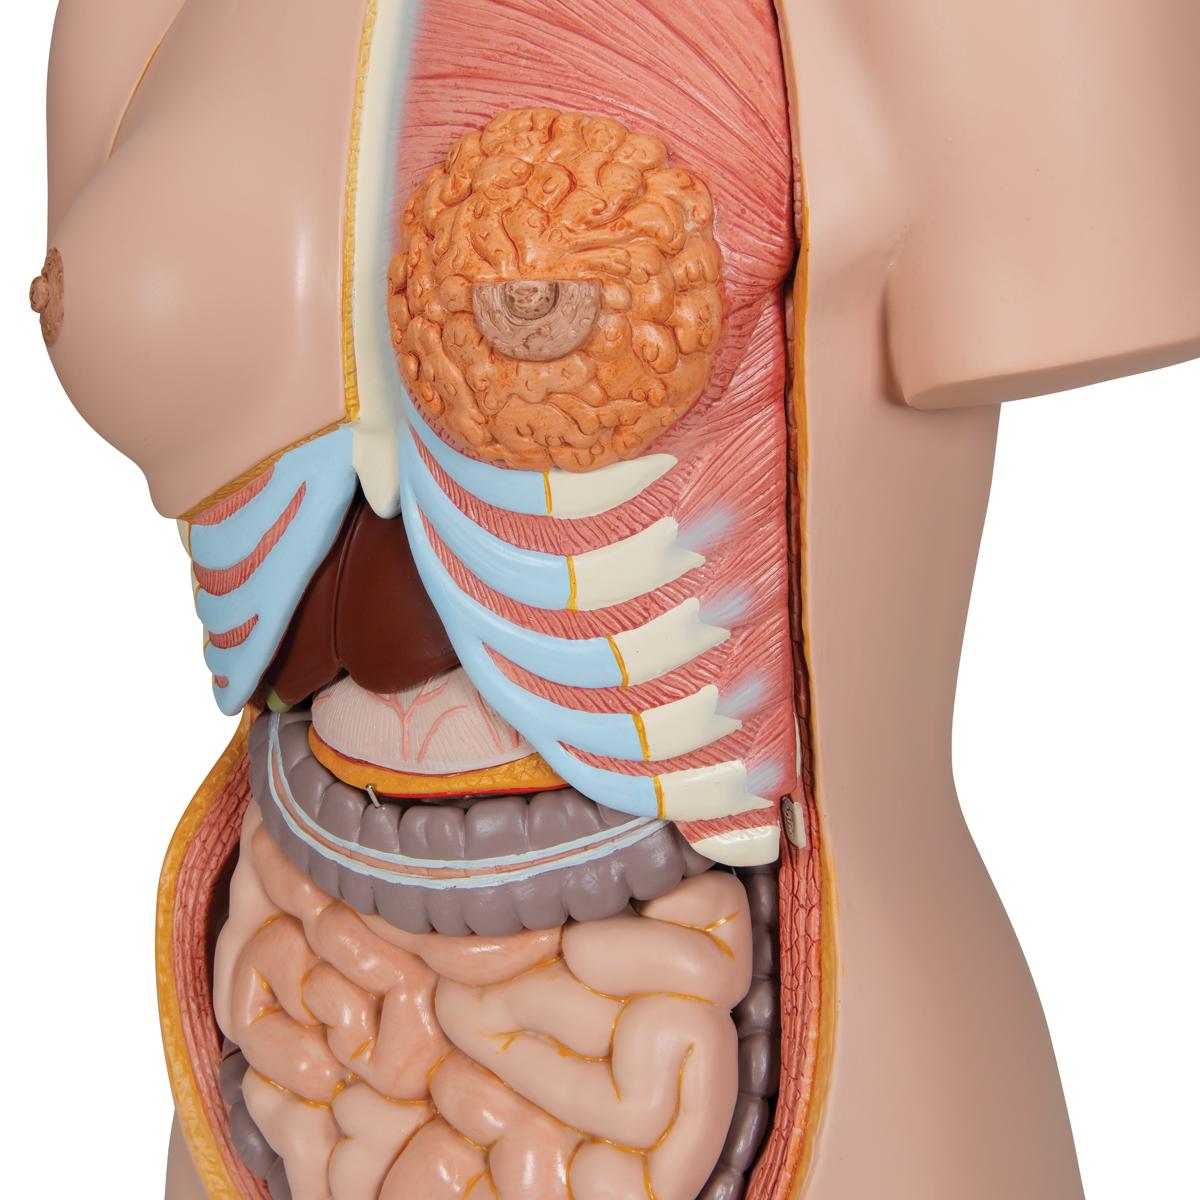 Human Anatomy Sex 78